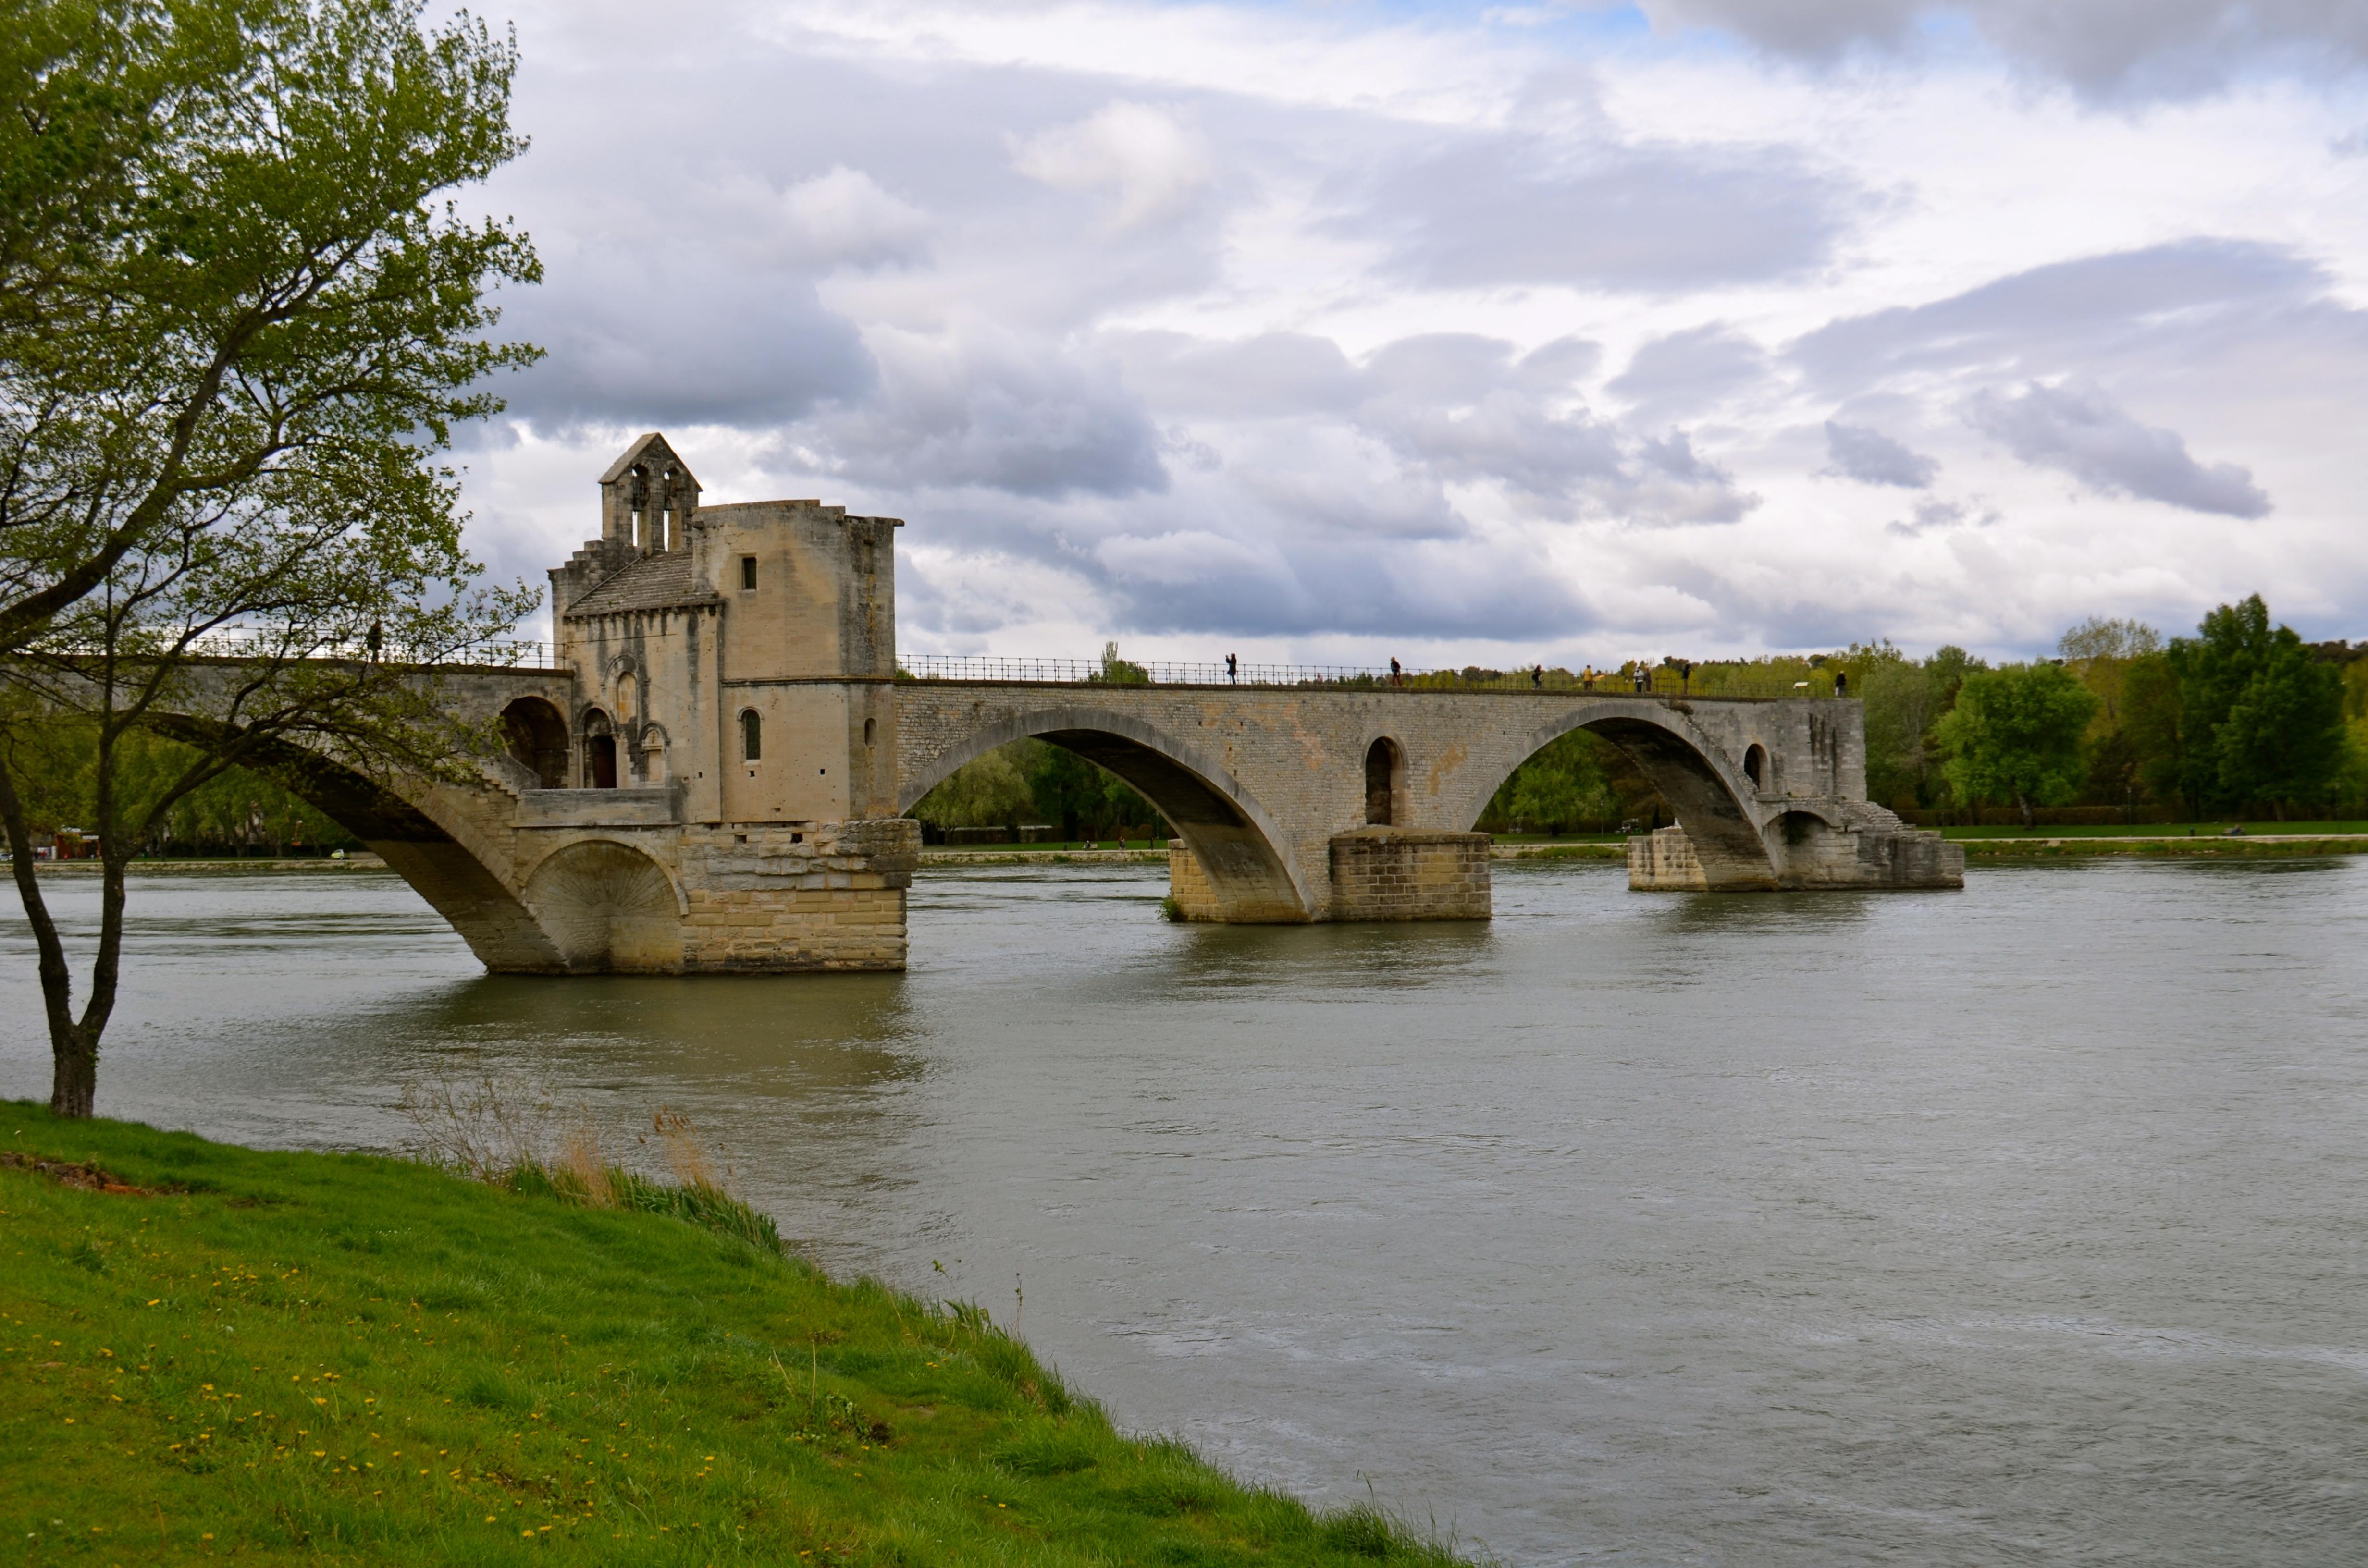 Nursery rhyme time le pont d avignon for Ch d avignon